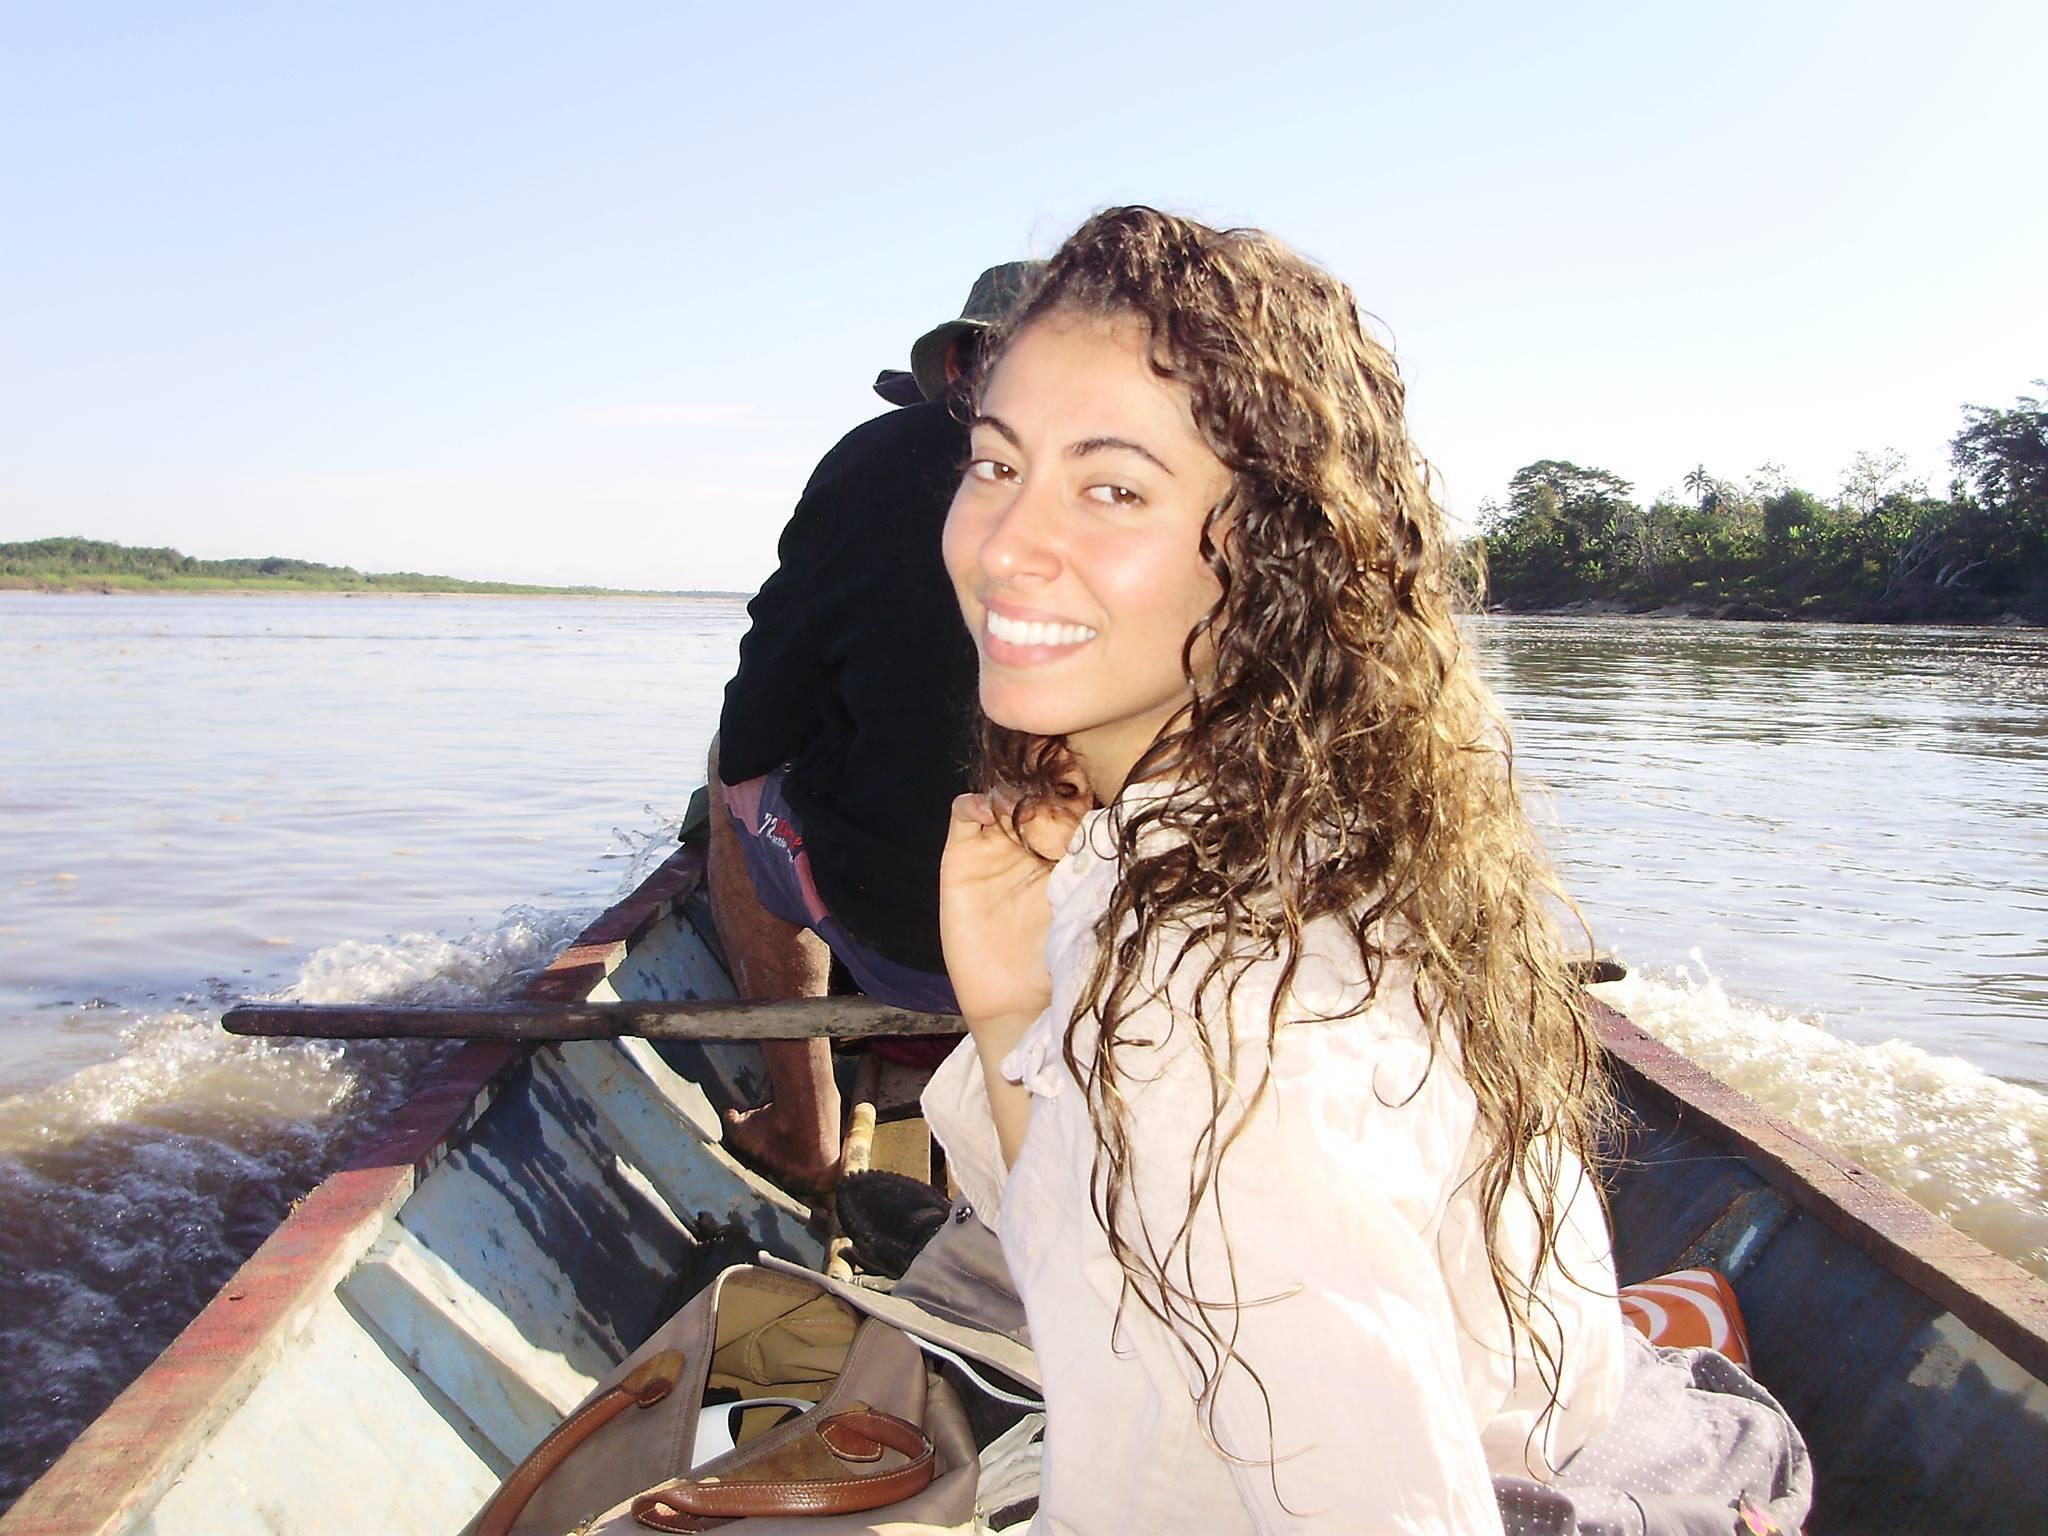 Dr. Nikki in Peru along the Ucayali River,2014